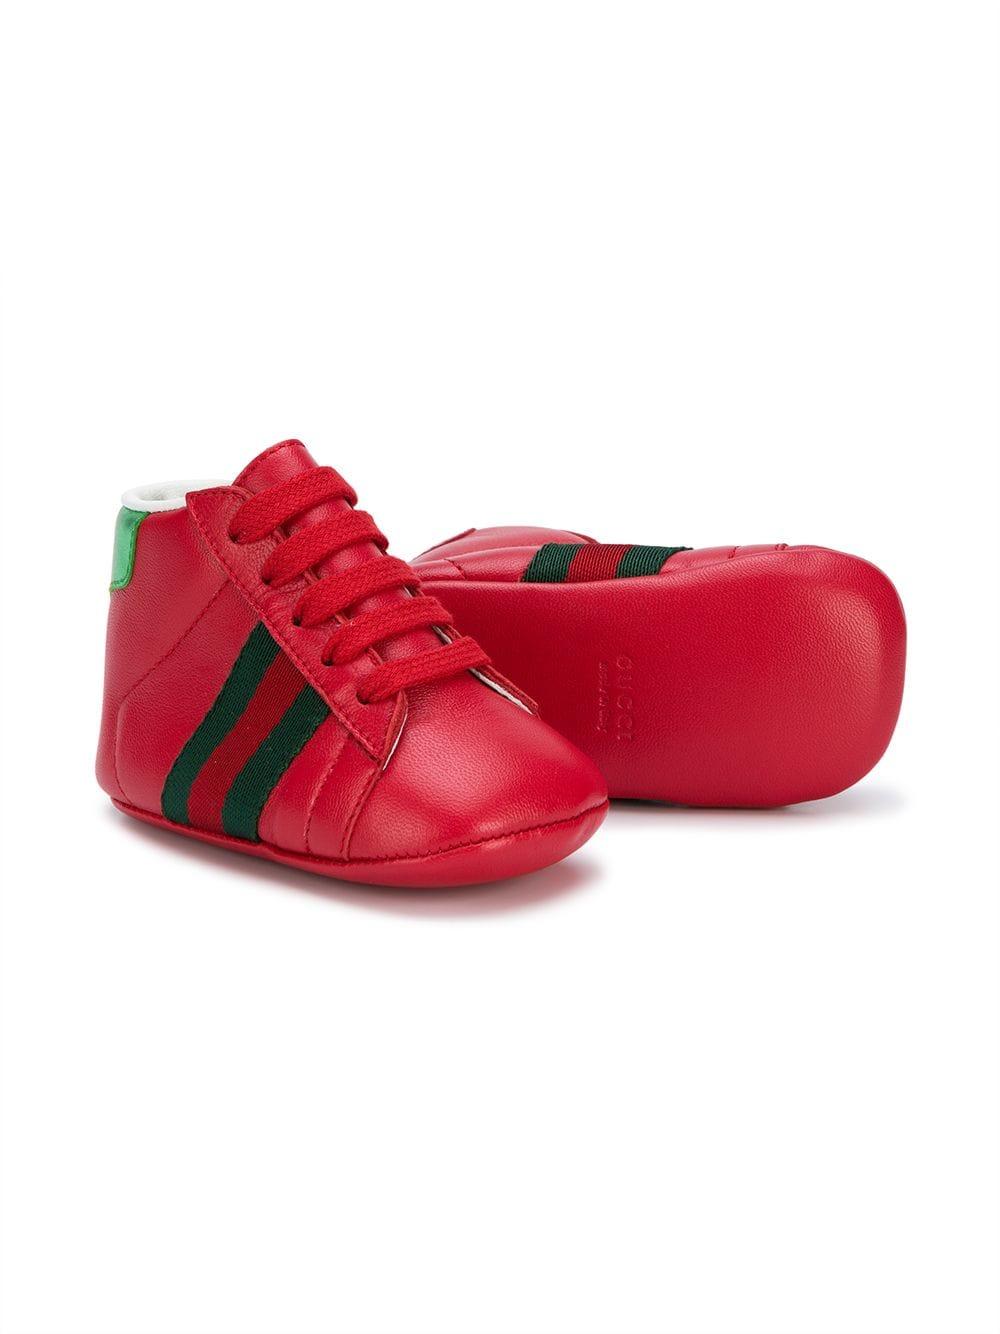 22b1a0a49 Kids botas con raya lateral - rojo